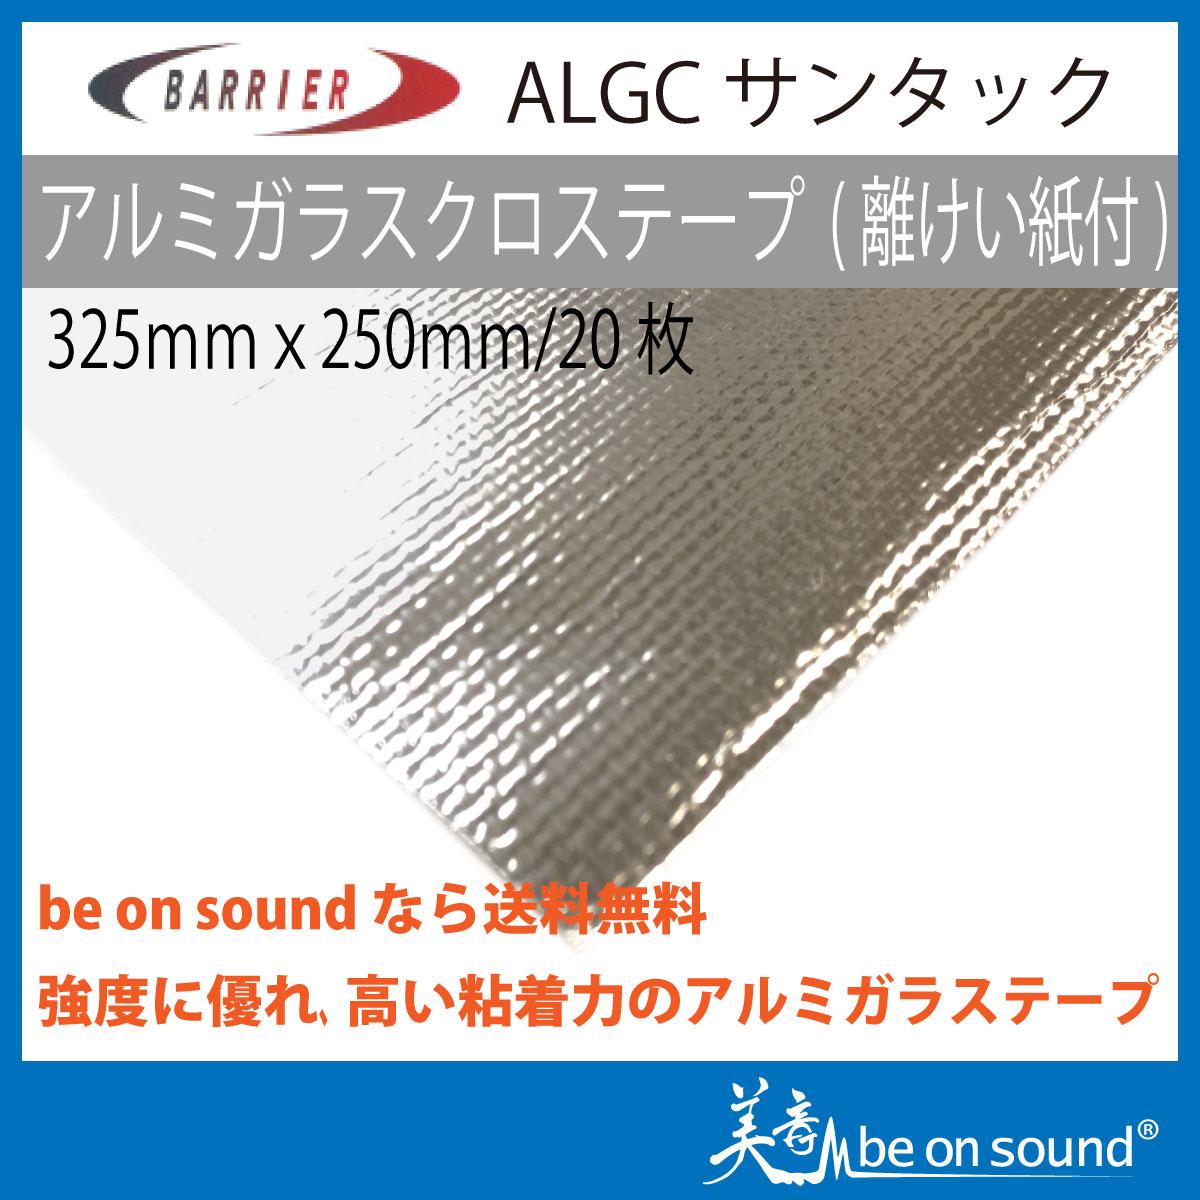 [325mmx250mm/ 20枚セット] サンヨーバリア ALGCサンタック アルミガラスクロステープ(離けい紙付)【be on sound】車 防音 防音シート 車 デッドニング アルミテープ ガラスクロス 補修テープ 強粘着 耐熱テープ